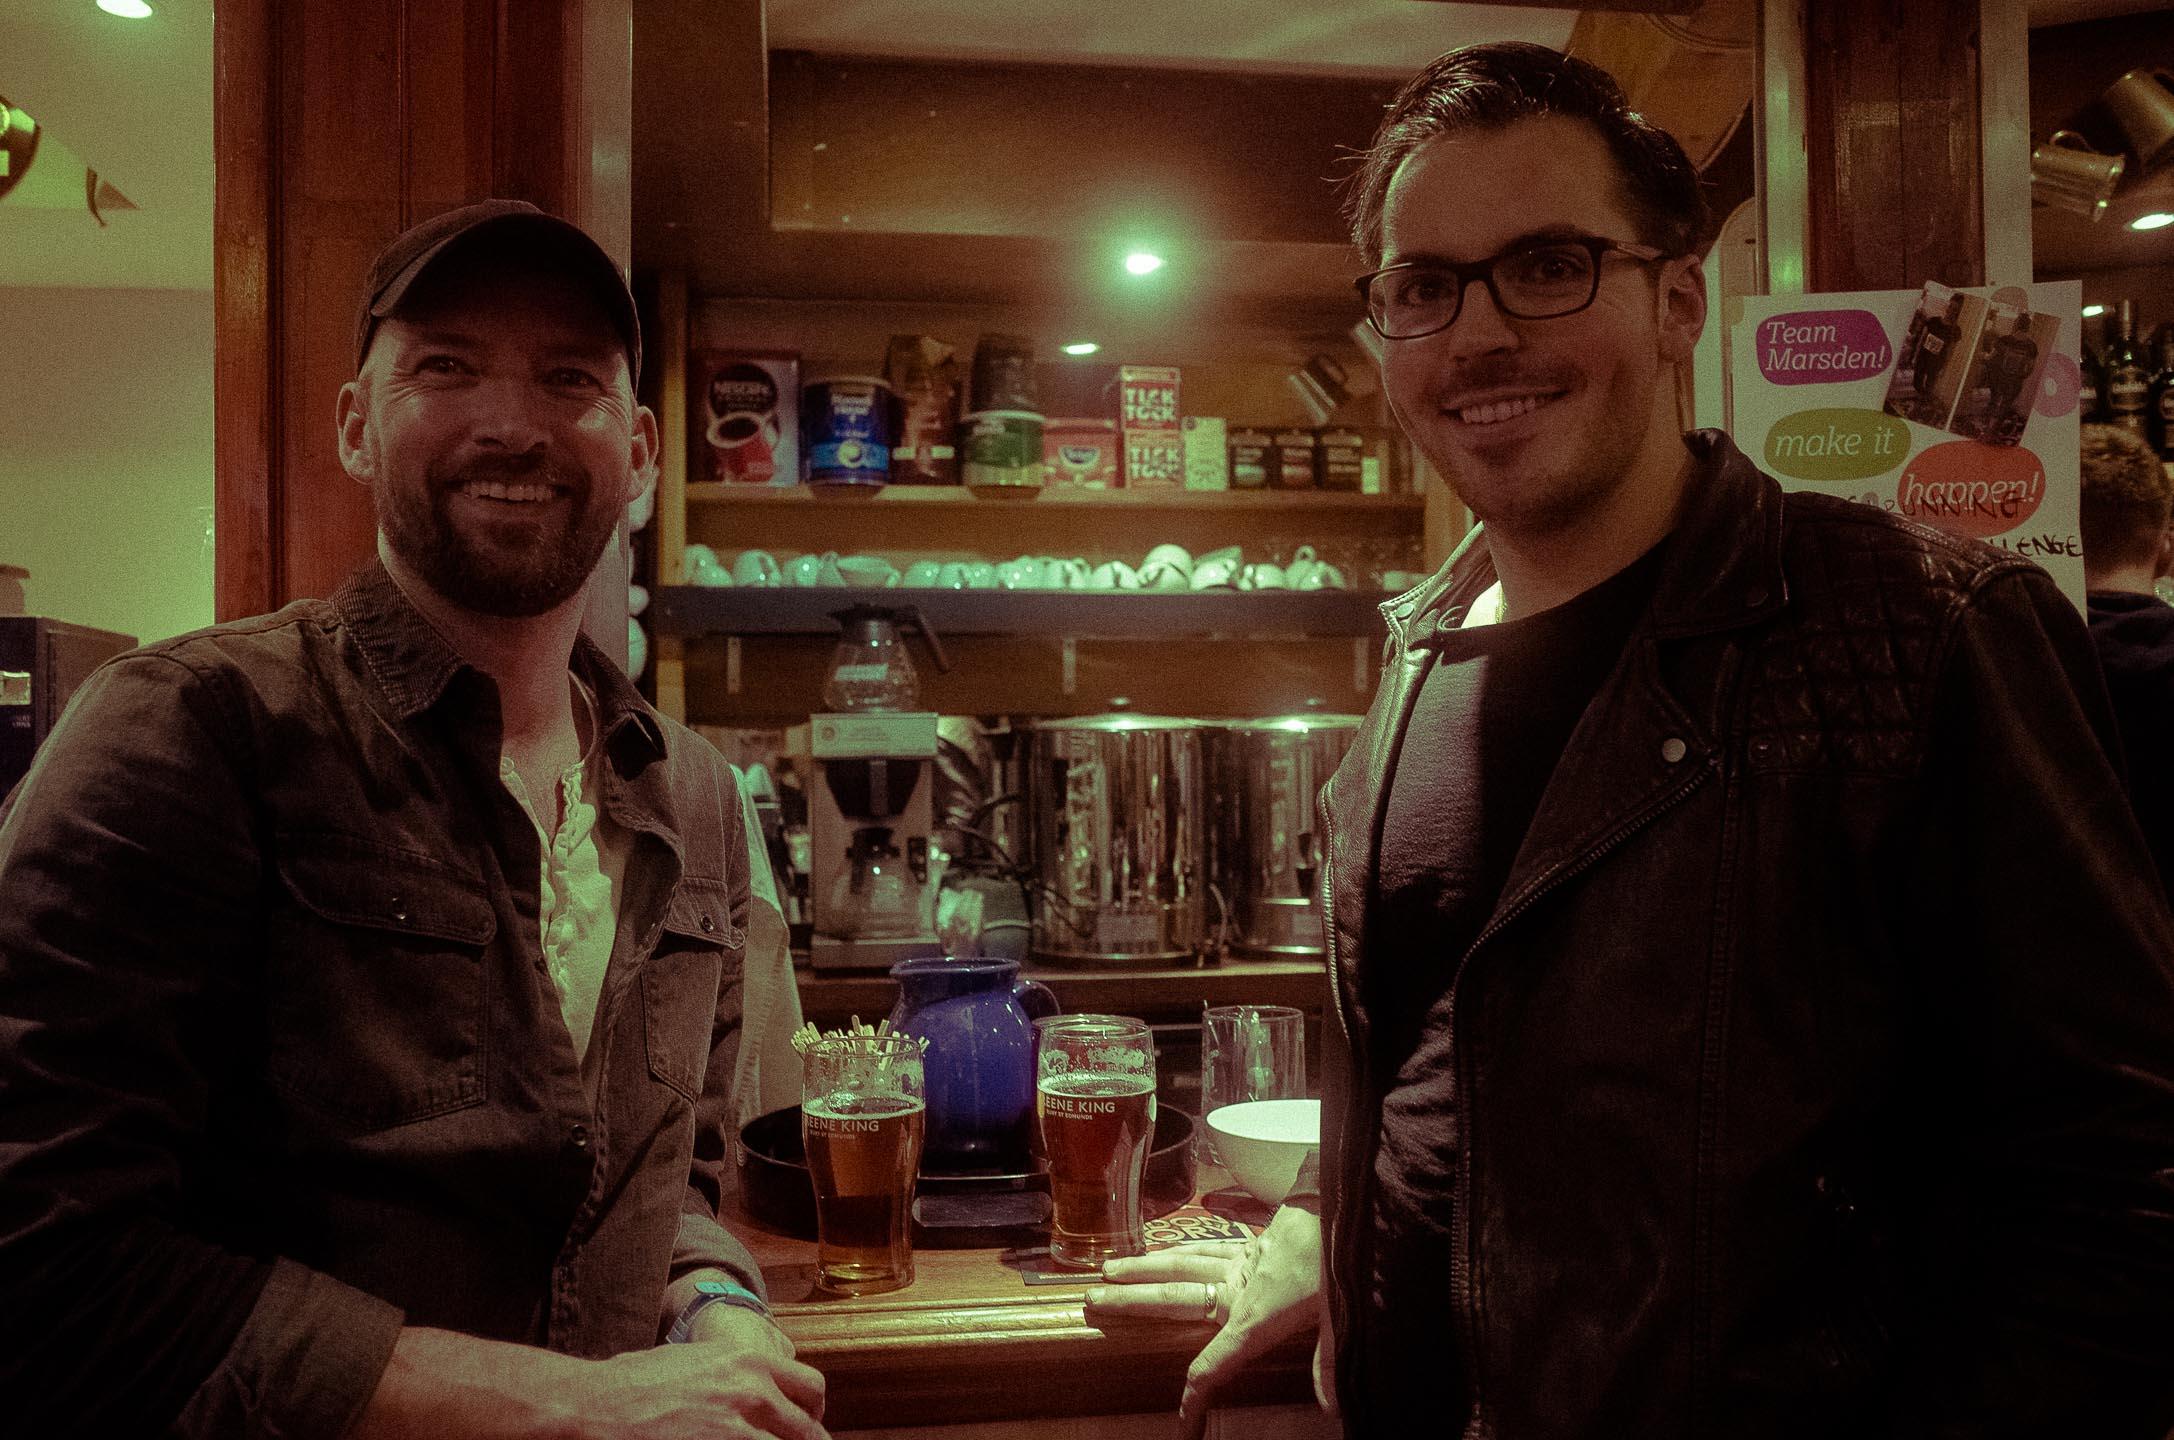 Joe Topping & Scott Poley